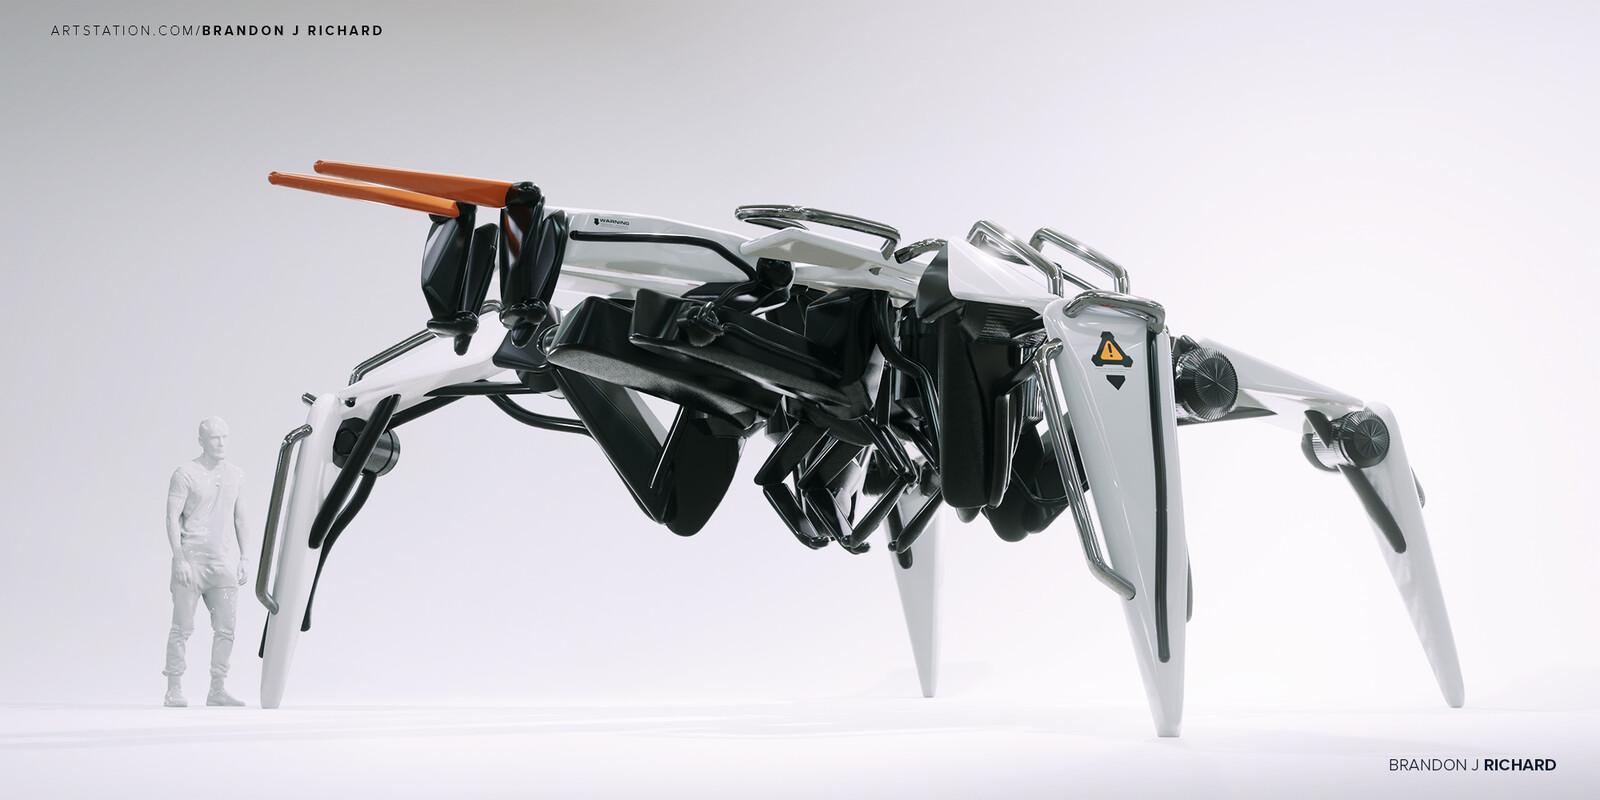 Hexapod Industrial Service Bot